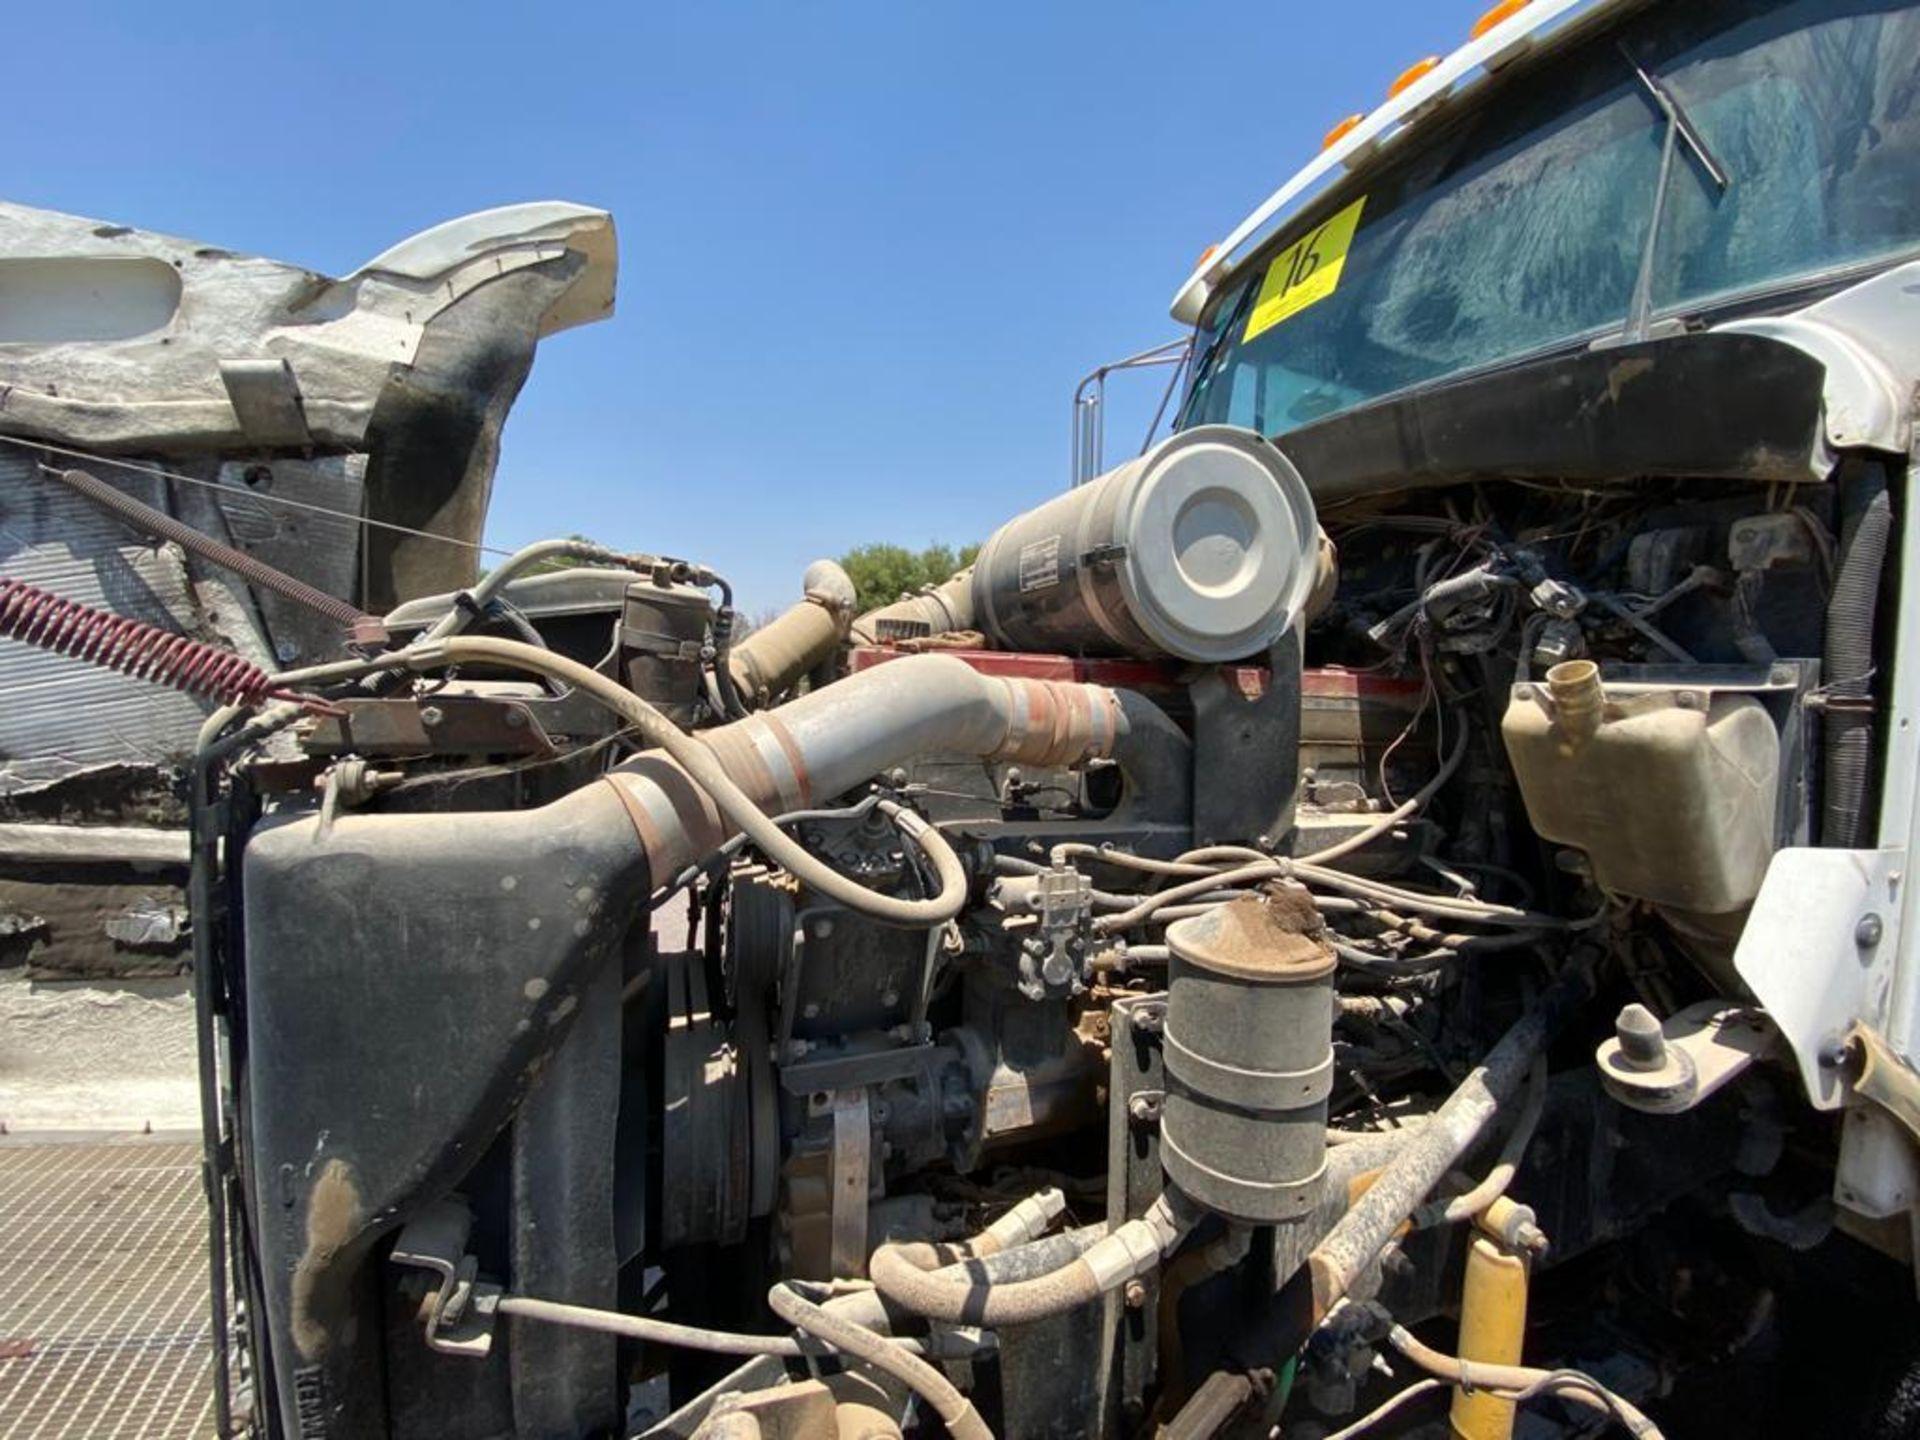 1998 Kenworth 5000 Gallon, standard transmission of 16 speeds - Image 54 of 68